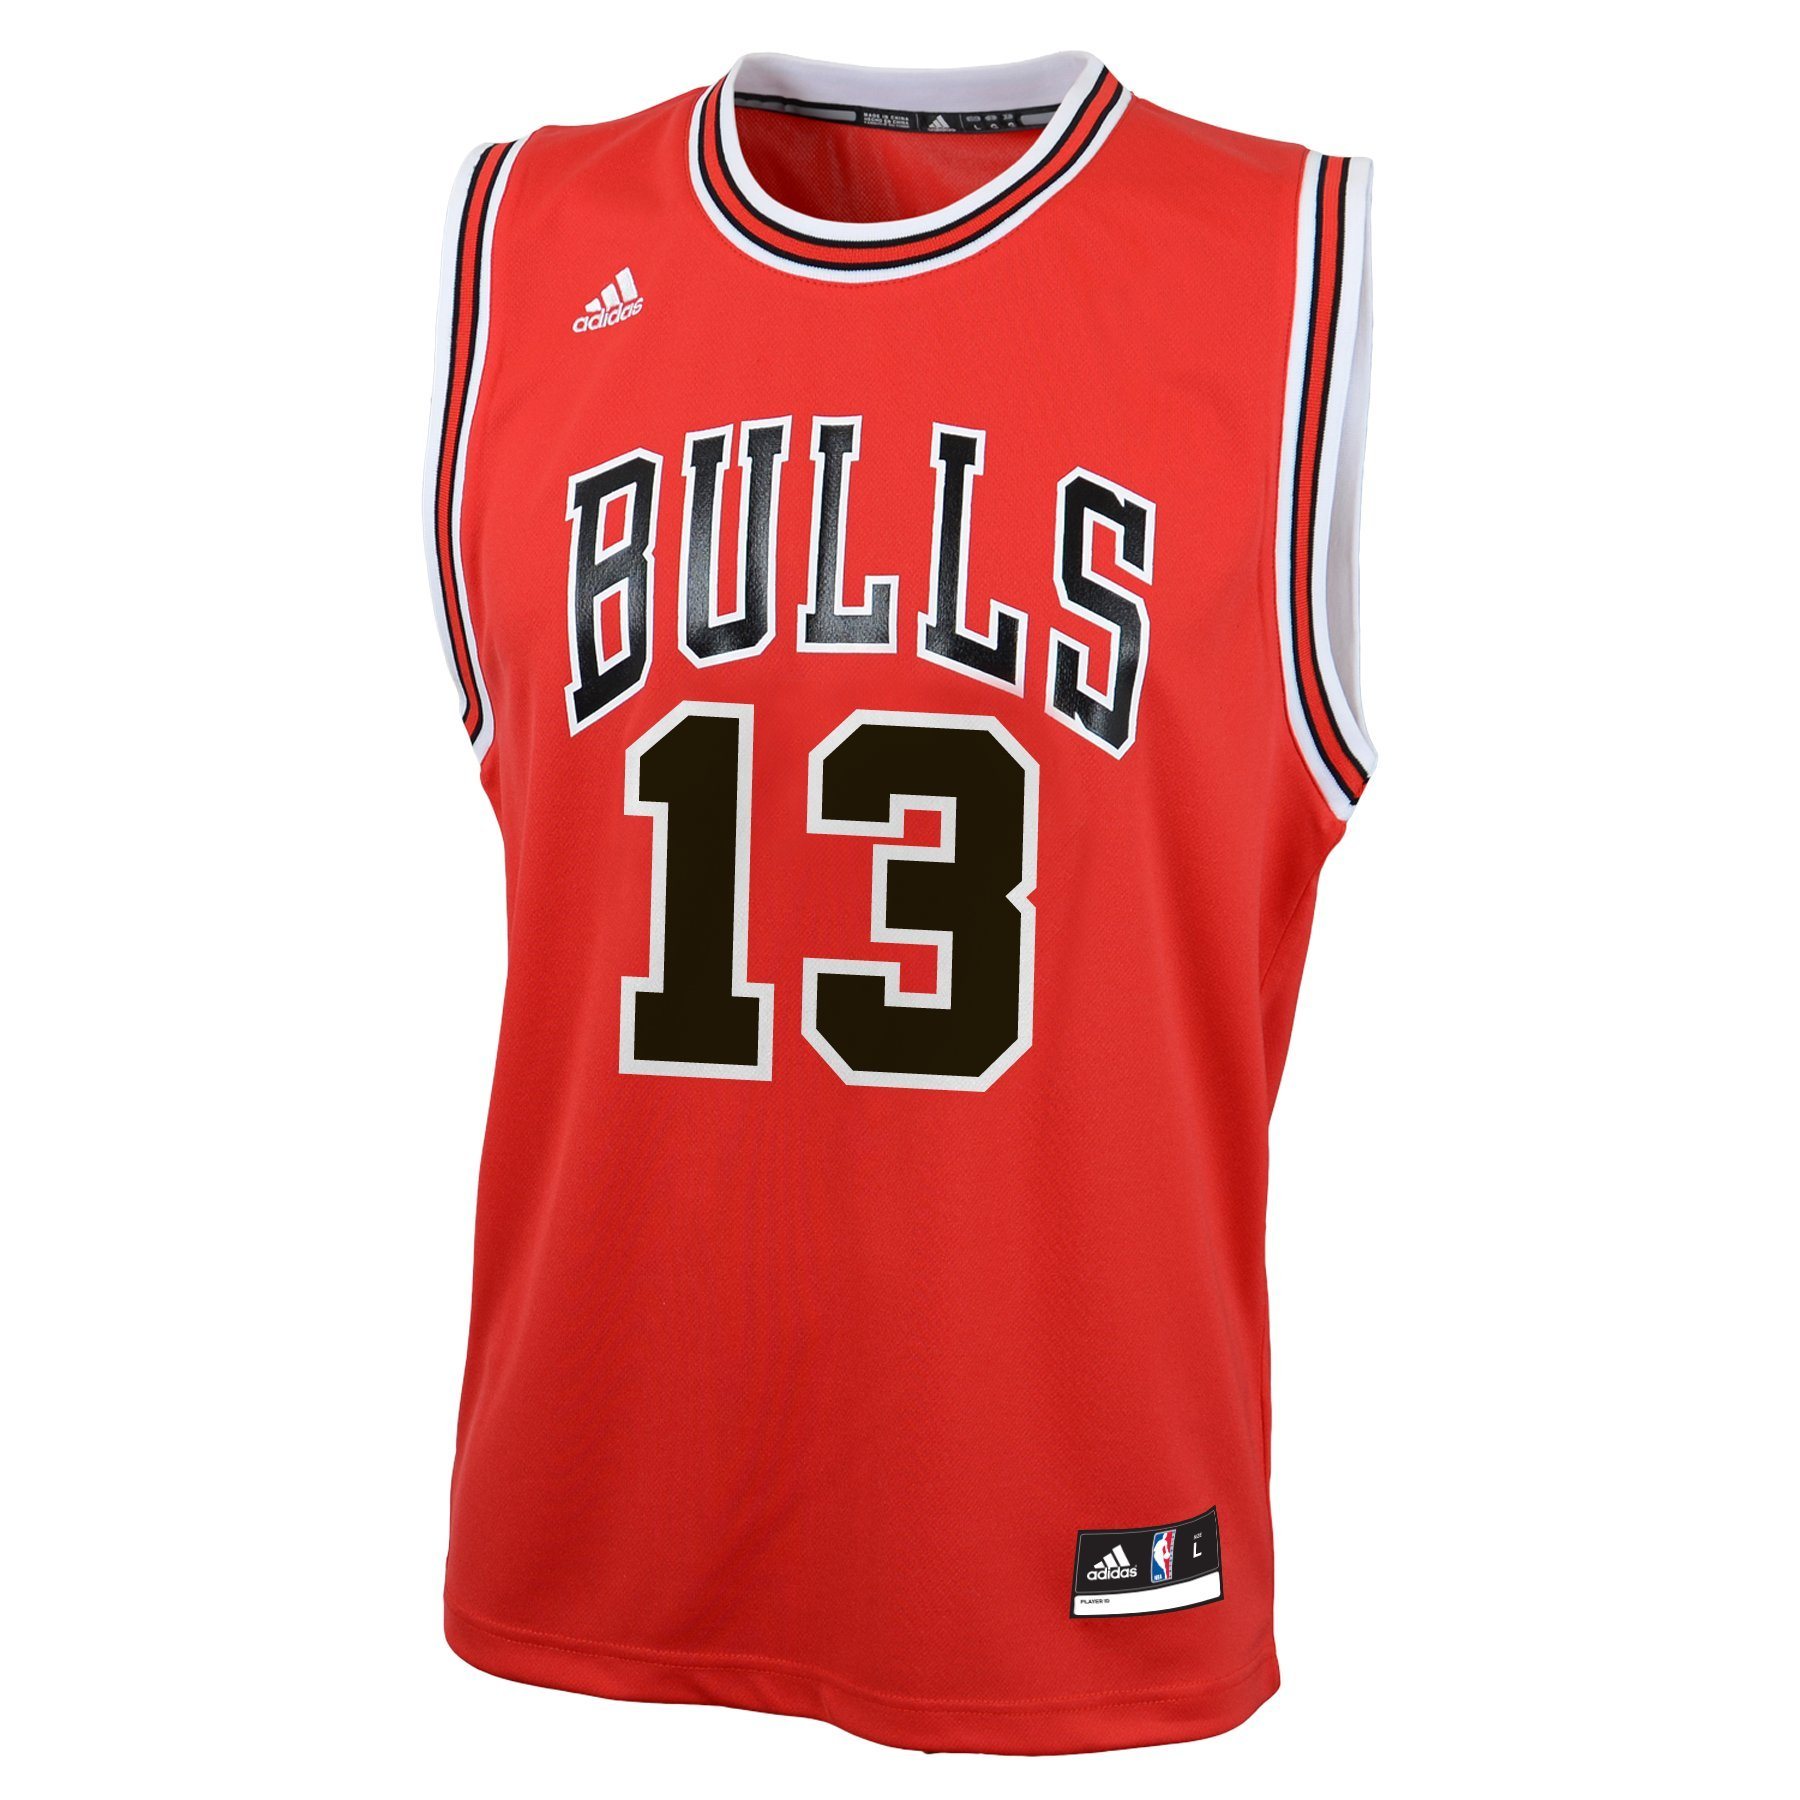 Adidas Jimmy Butler Chicago Bulls NBA réplica jóvenes Jersey: Amazon.es: Libros